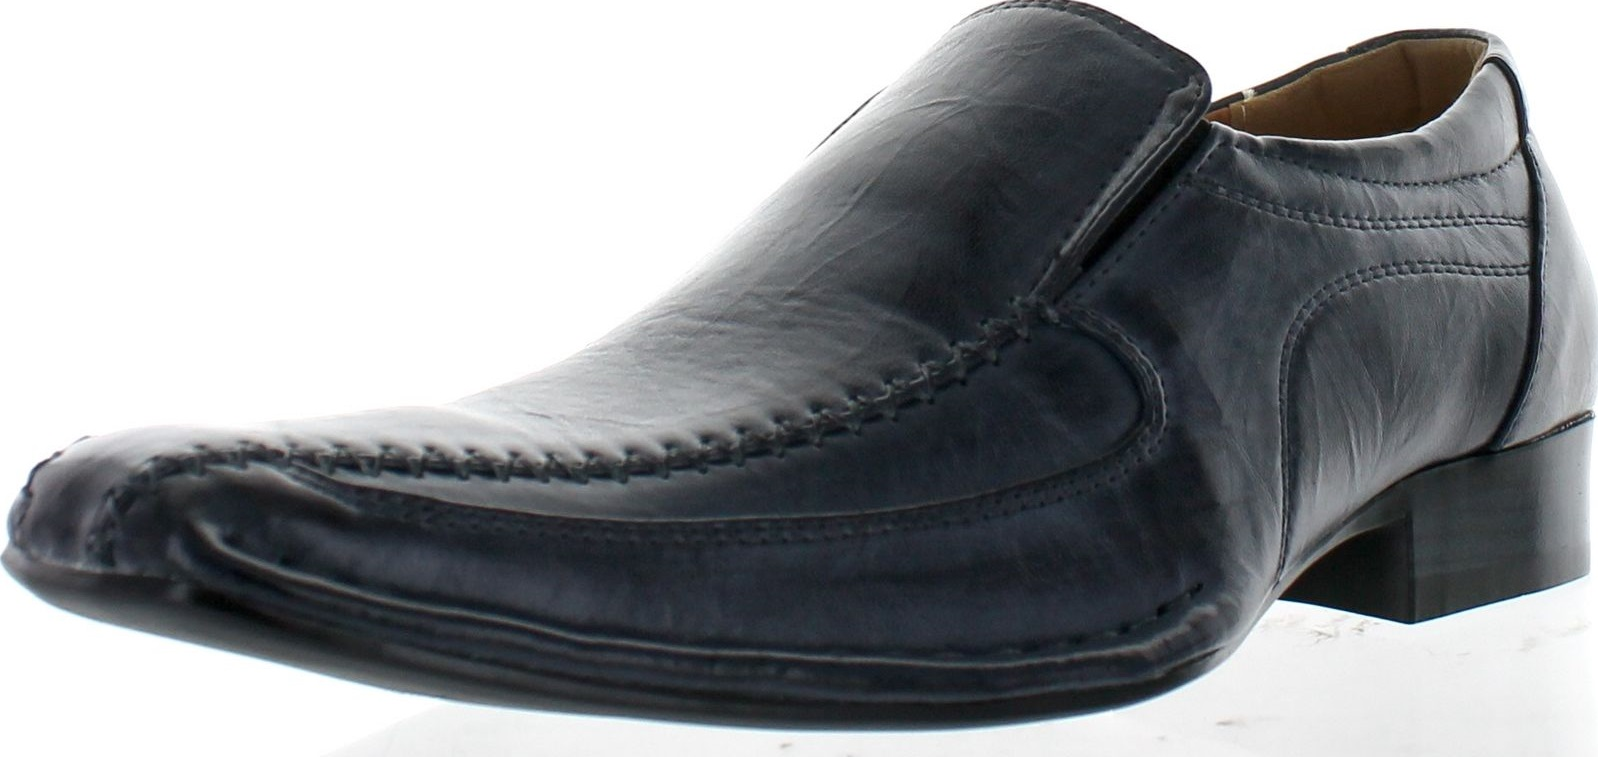 Men S Alberto Fellini Dress Shoes